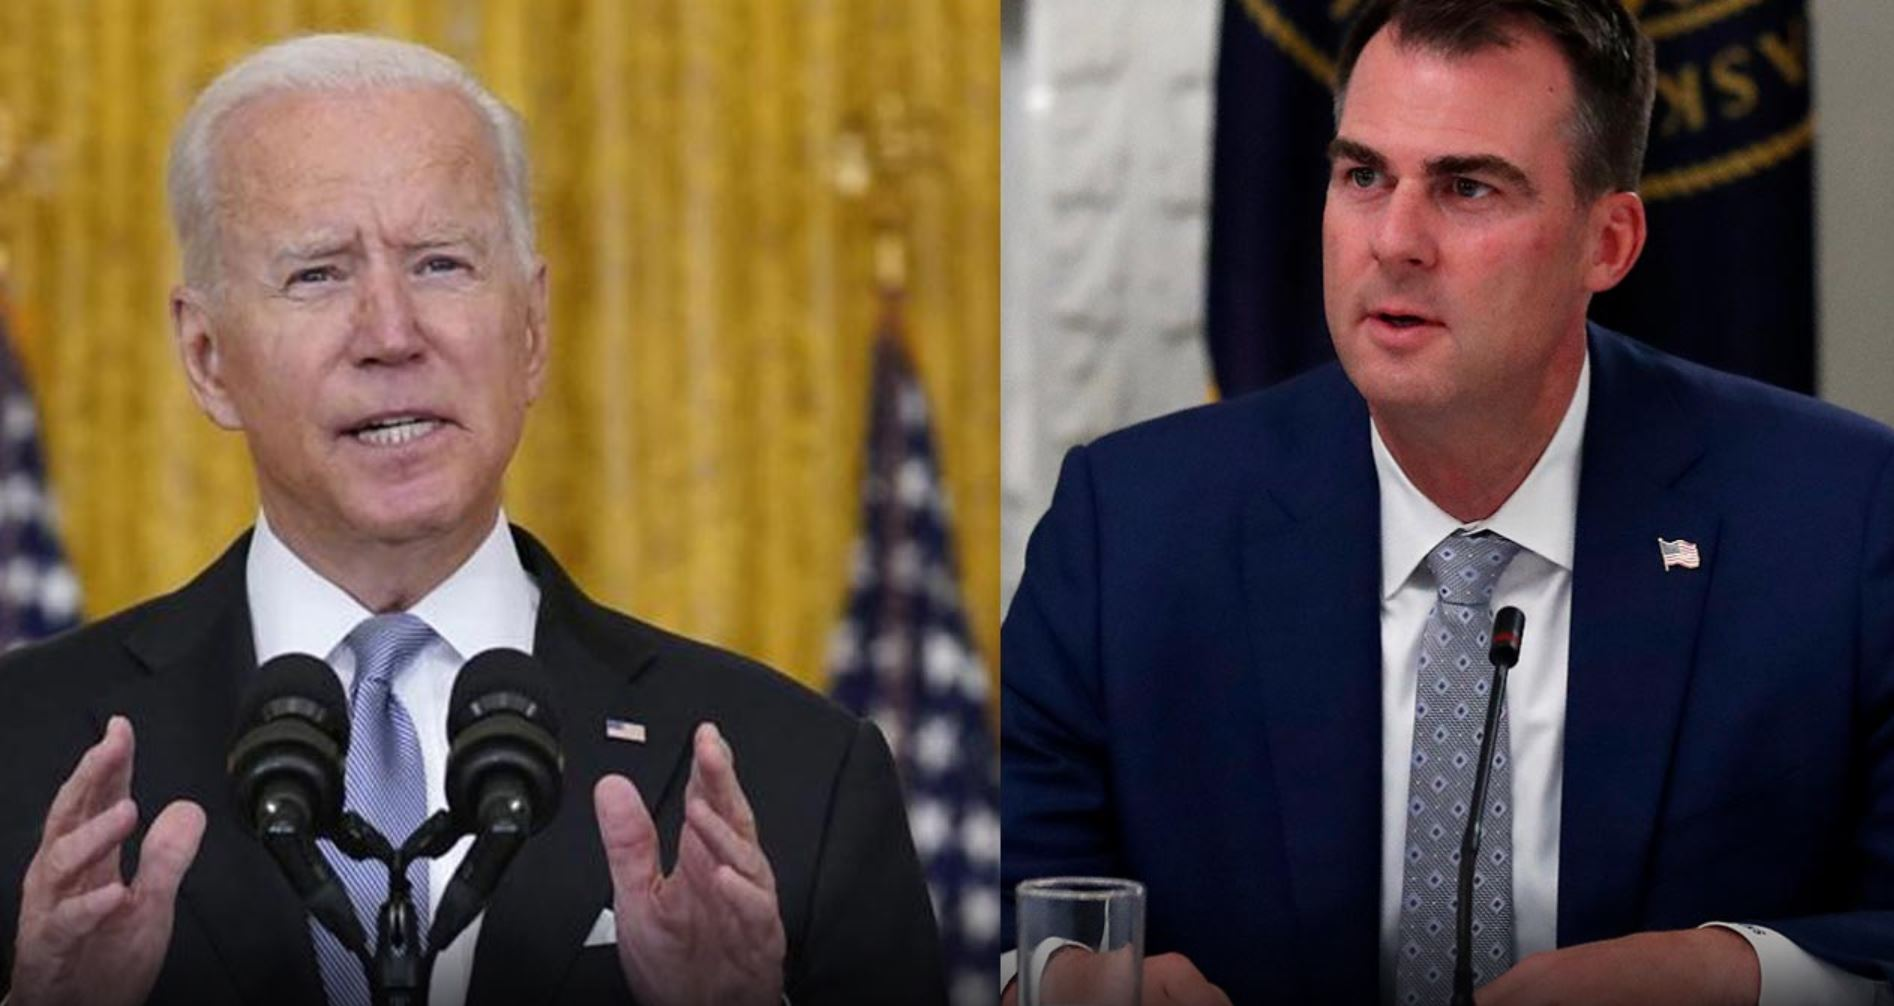 Governor Stitt Responds To Biden: 'There Will Be No Government Vaccine Mandates In Oklahoma'